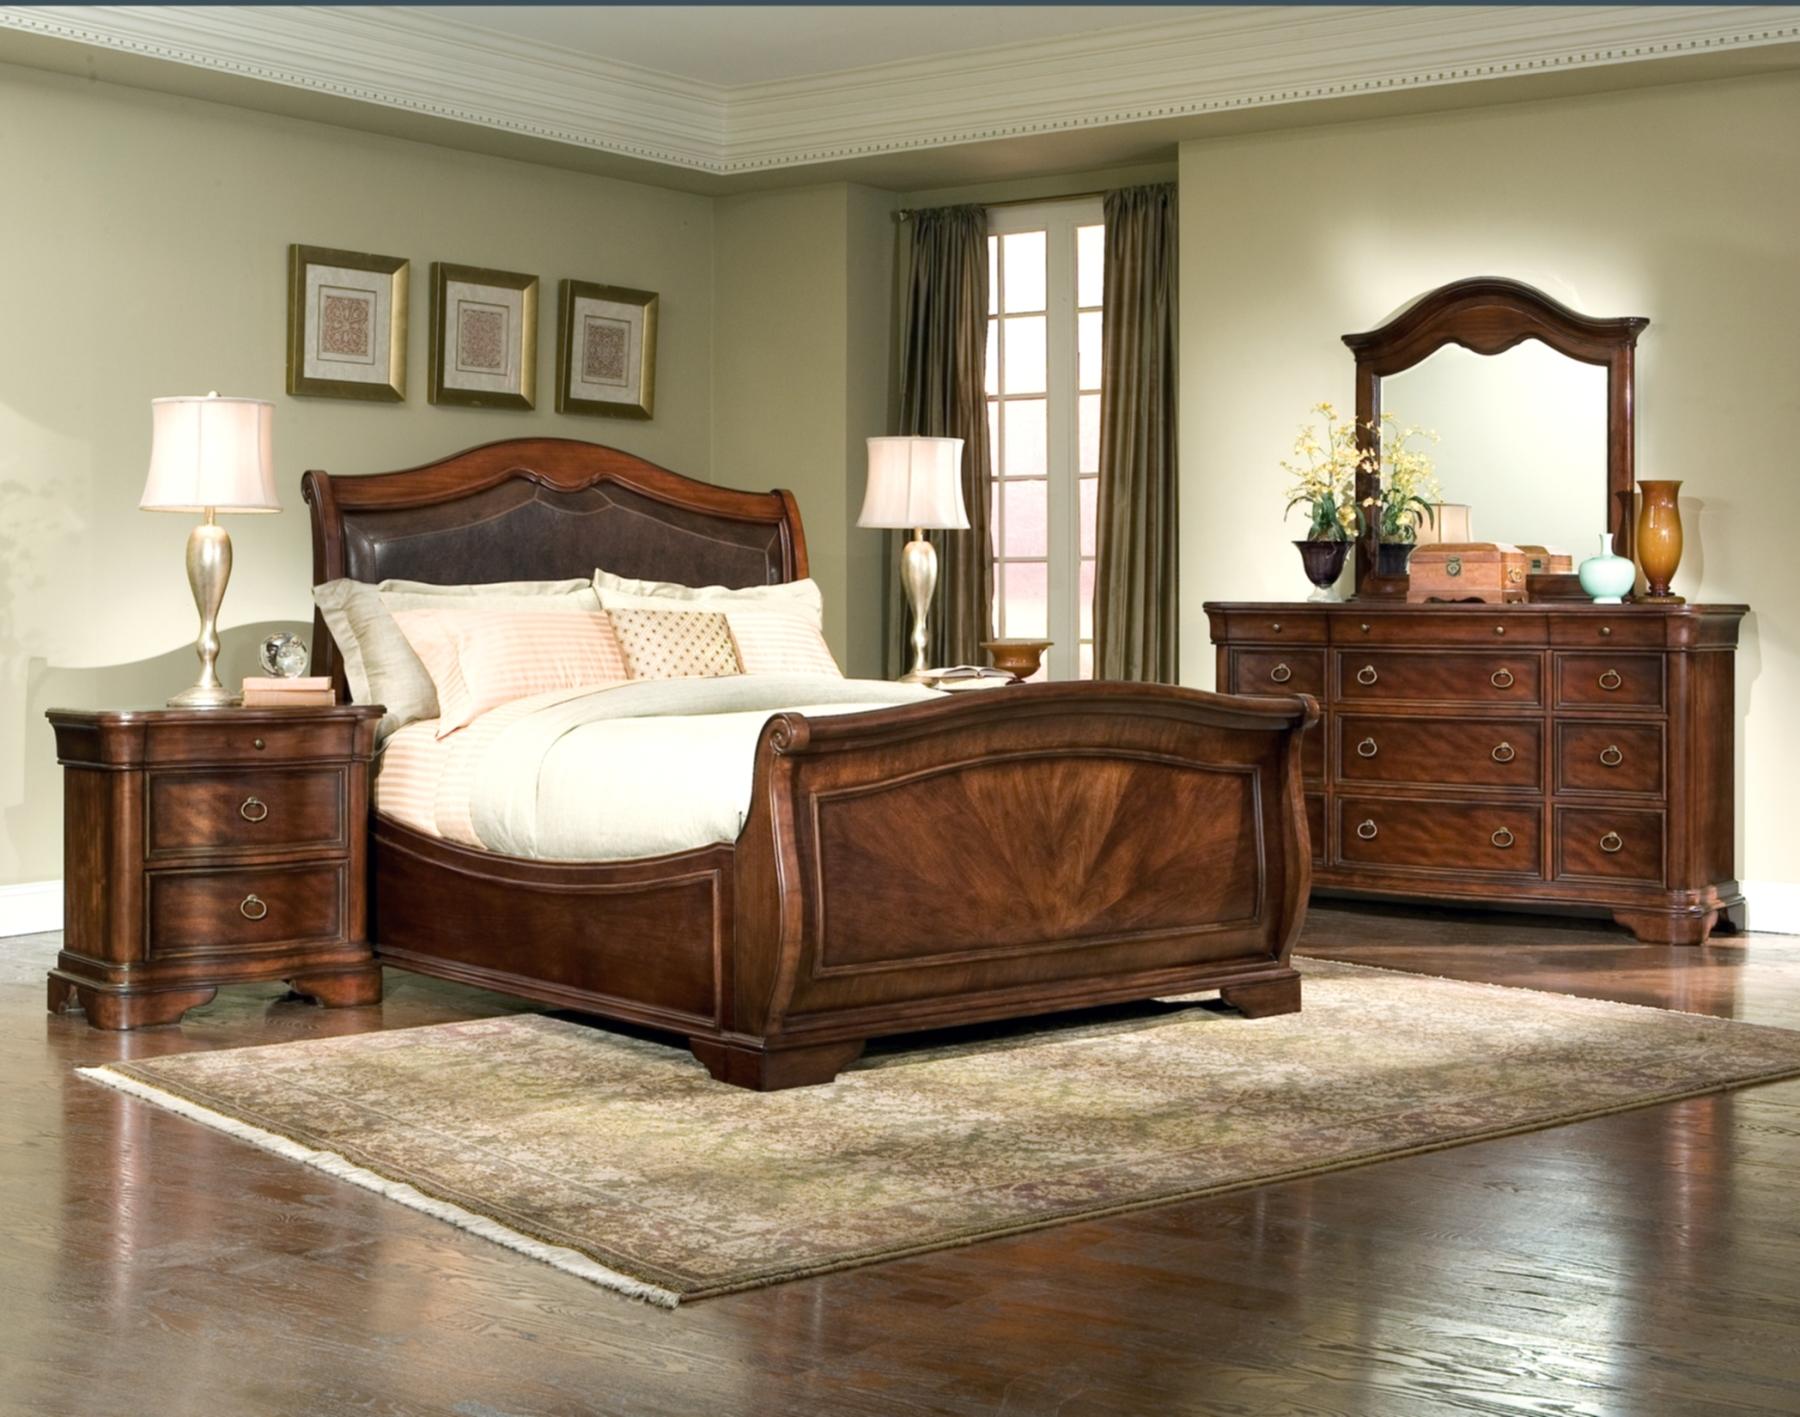 Furniture > Bedroom Furniture > Leather > Heritage Court Leather